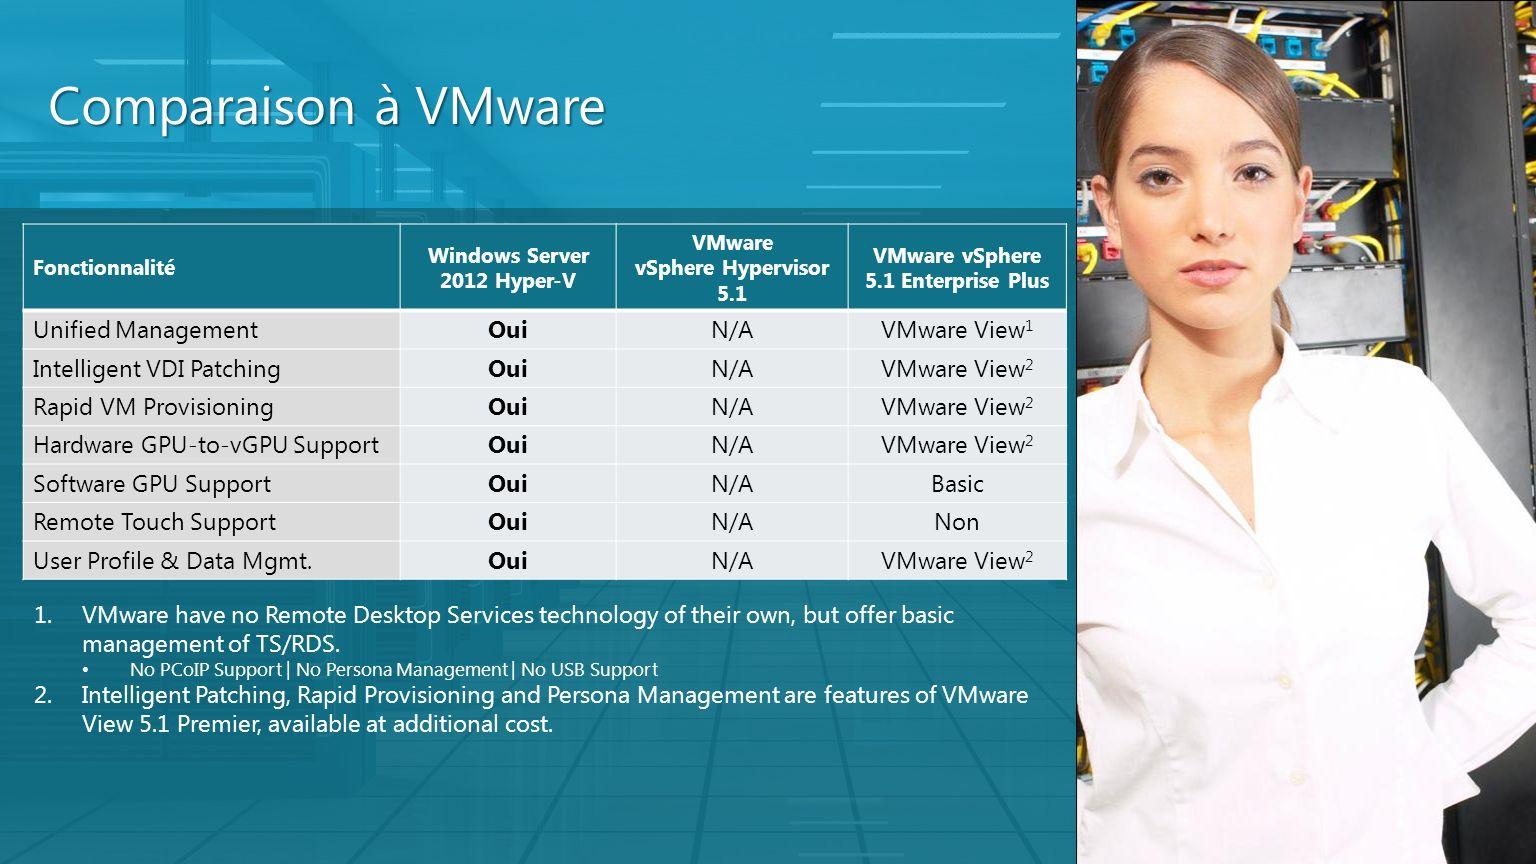 Comparaison à VMware Fonctionnalité Windows Server 2012 Hyper-V VMware vSphere Hypervisor 5.1 VMware vSphere 5.1 Enterprise Plus Unified ManagementOui